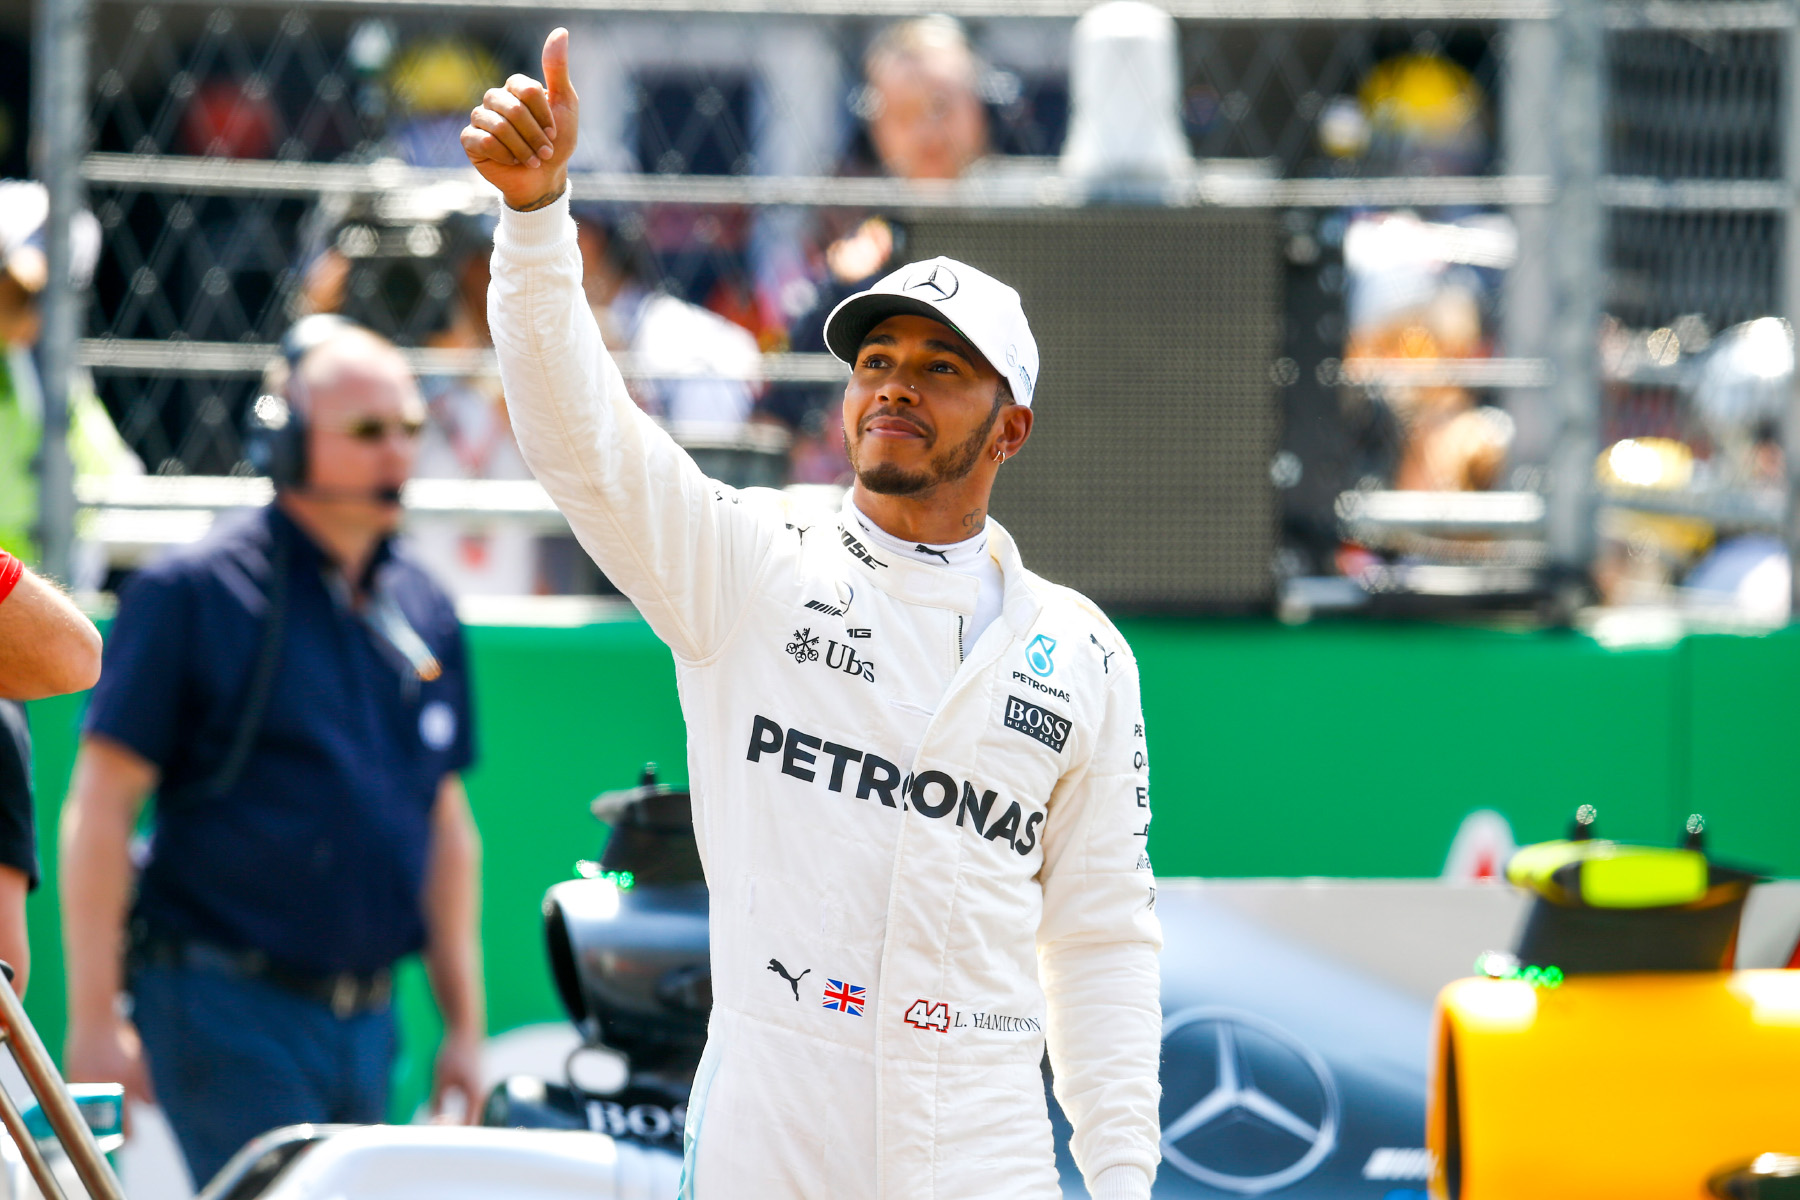 Lewis Hamilton celebrates at the 2017 Mexican Grand Prix.